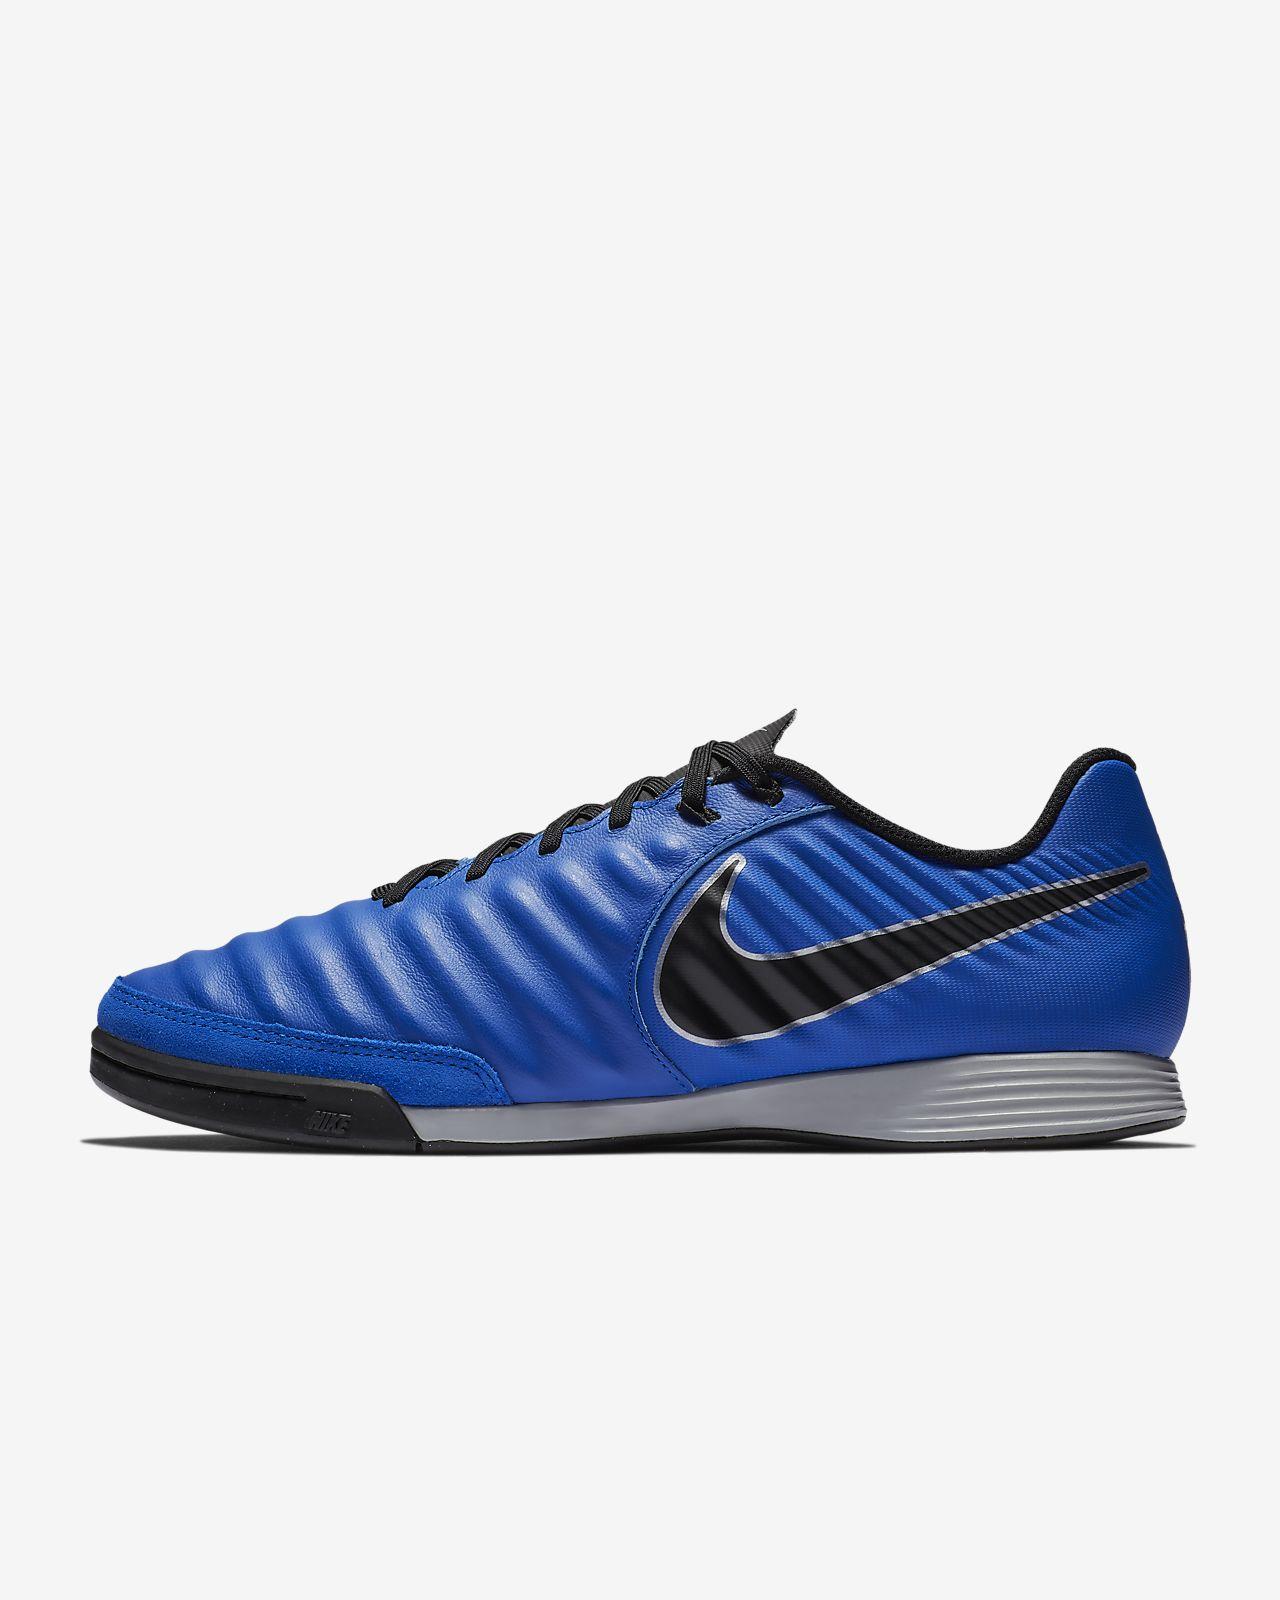 Academy Nike Football 7 Salle Legendx De Crampons À Ic Chaussure En gf5qHwA8z